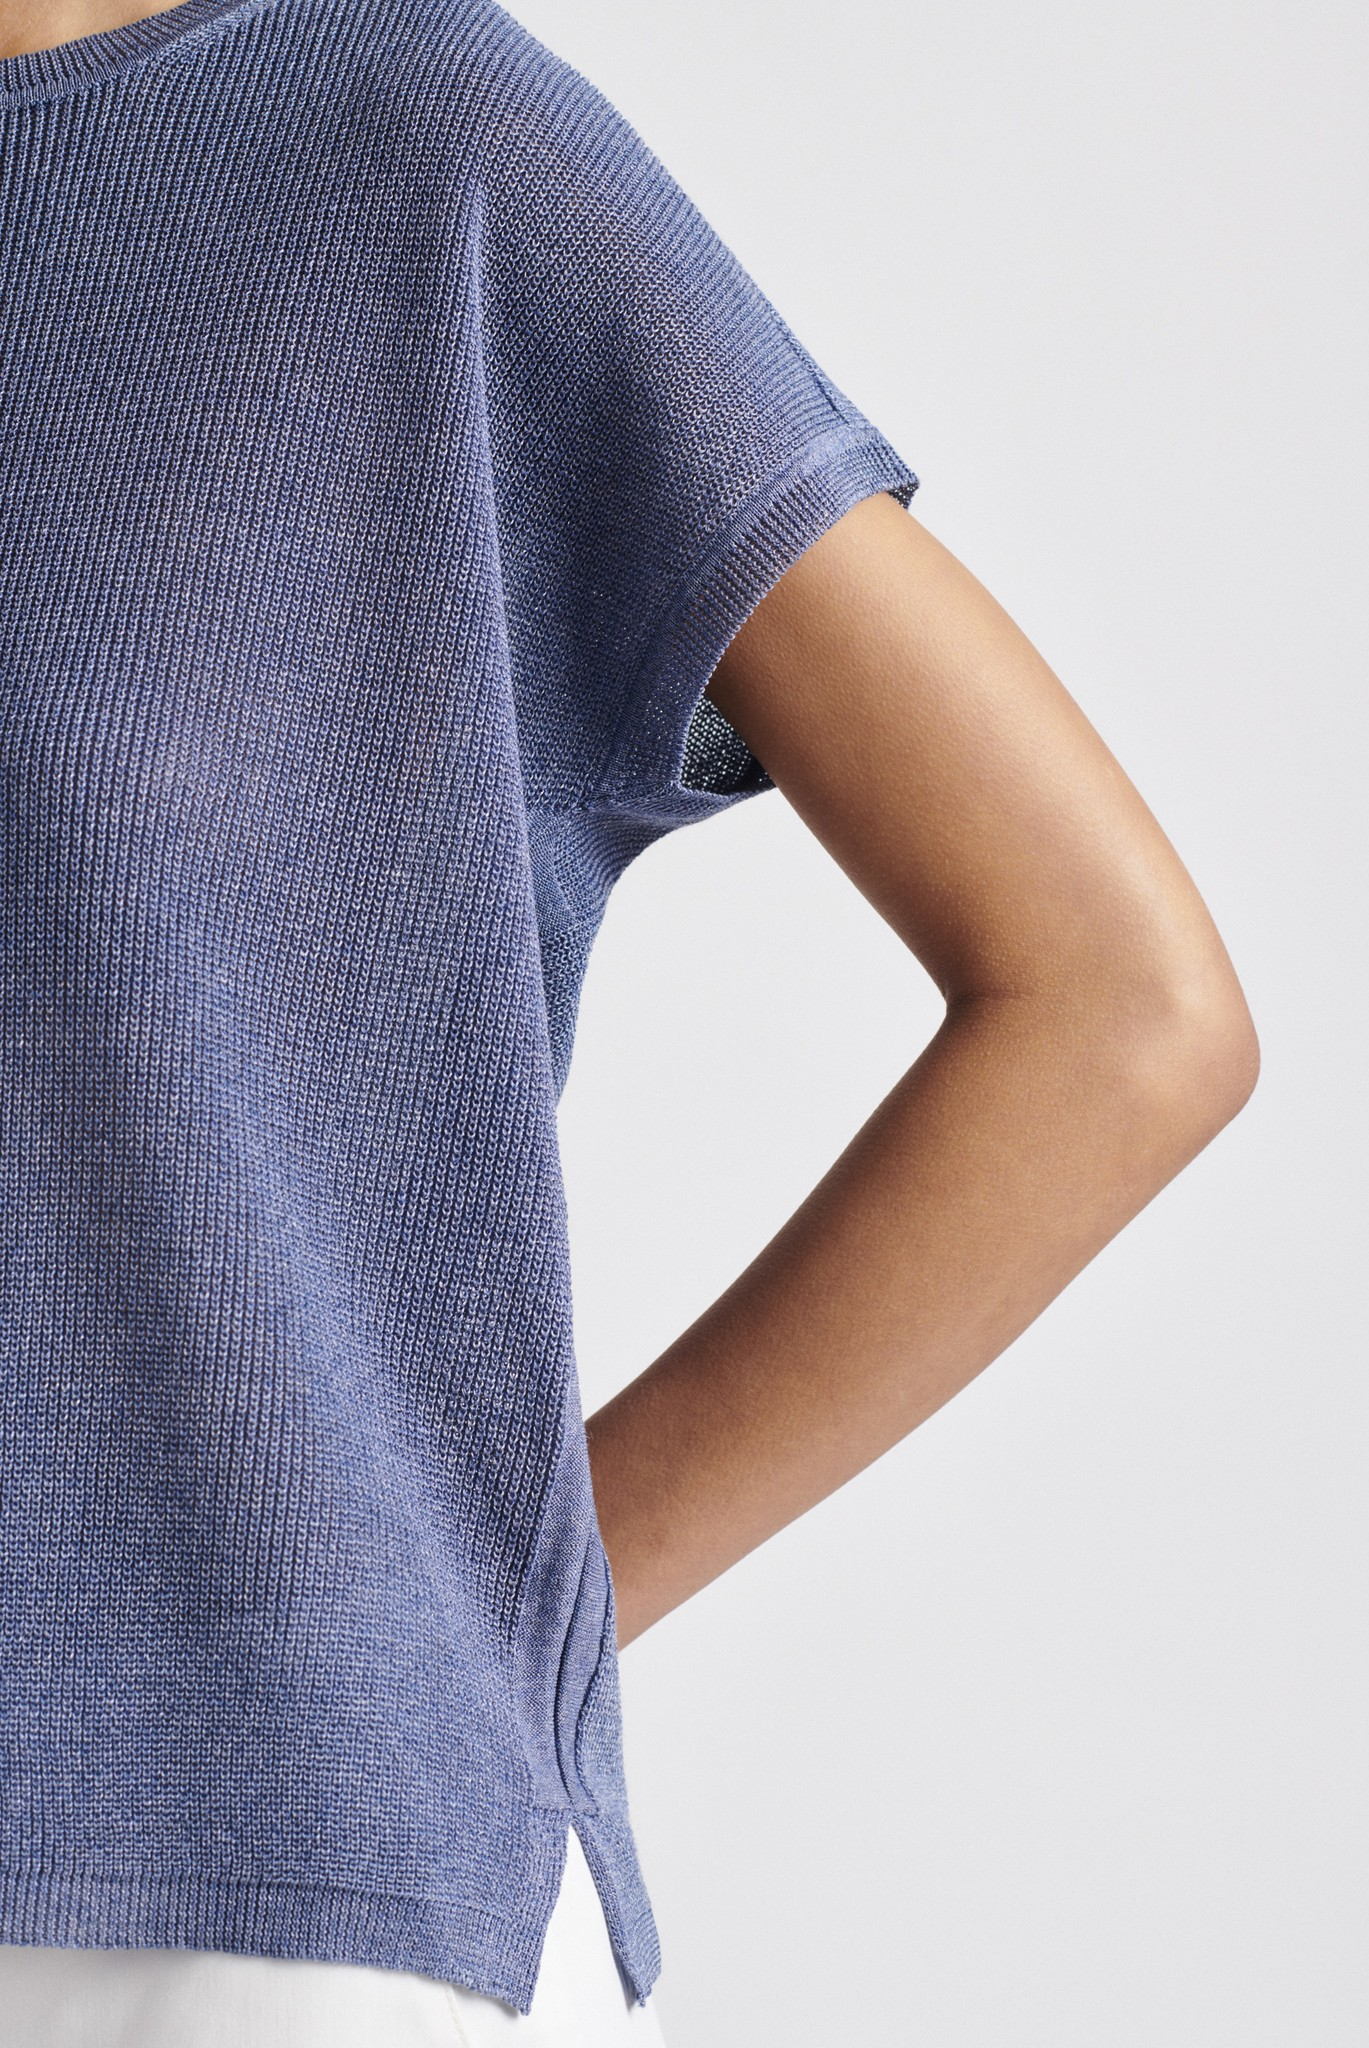 ELLY - Легкий джемпер с коротким рукавом